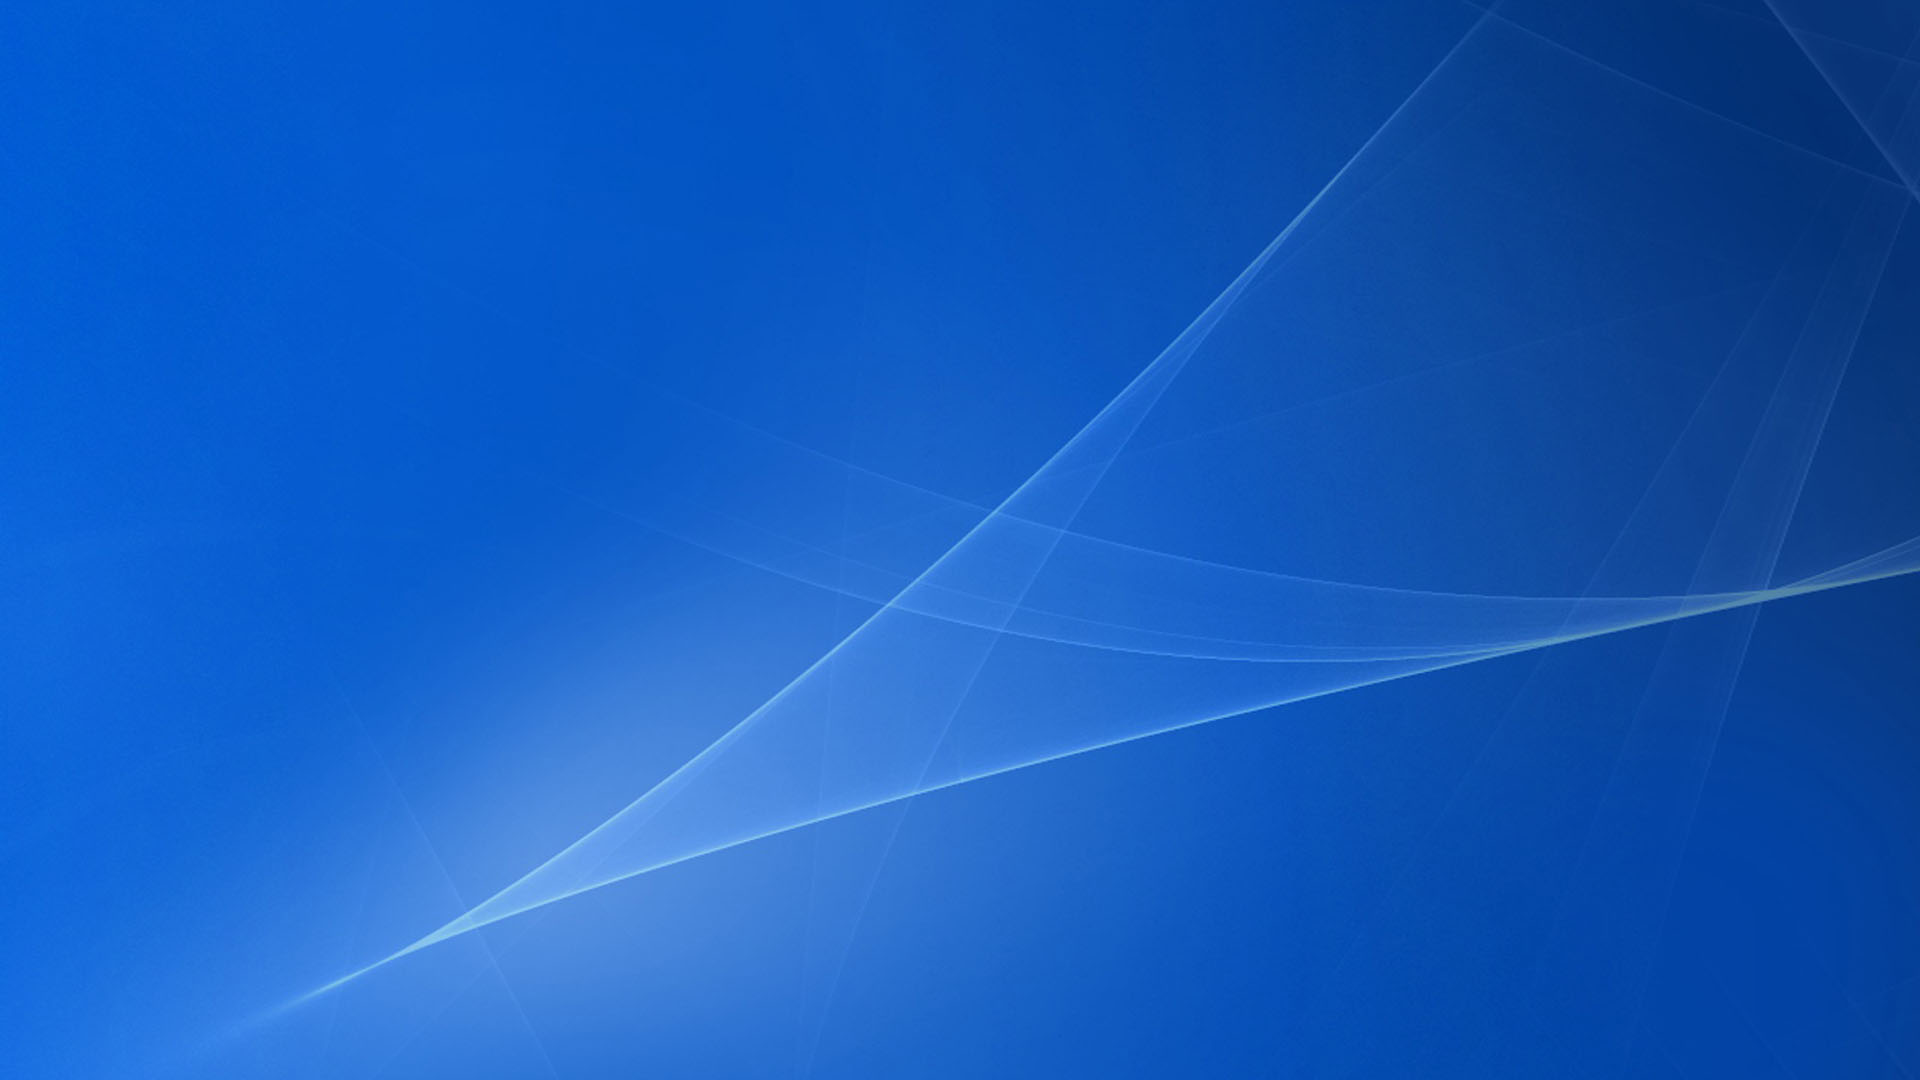 Blue Hd Wallpapers 1080P wallpaper   889557 1920x1080